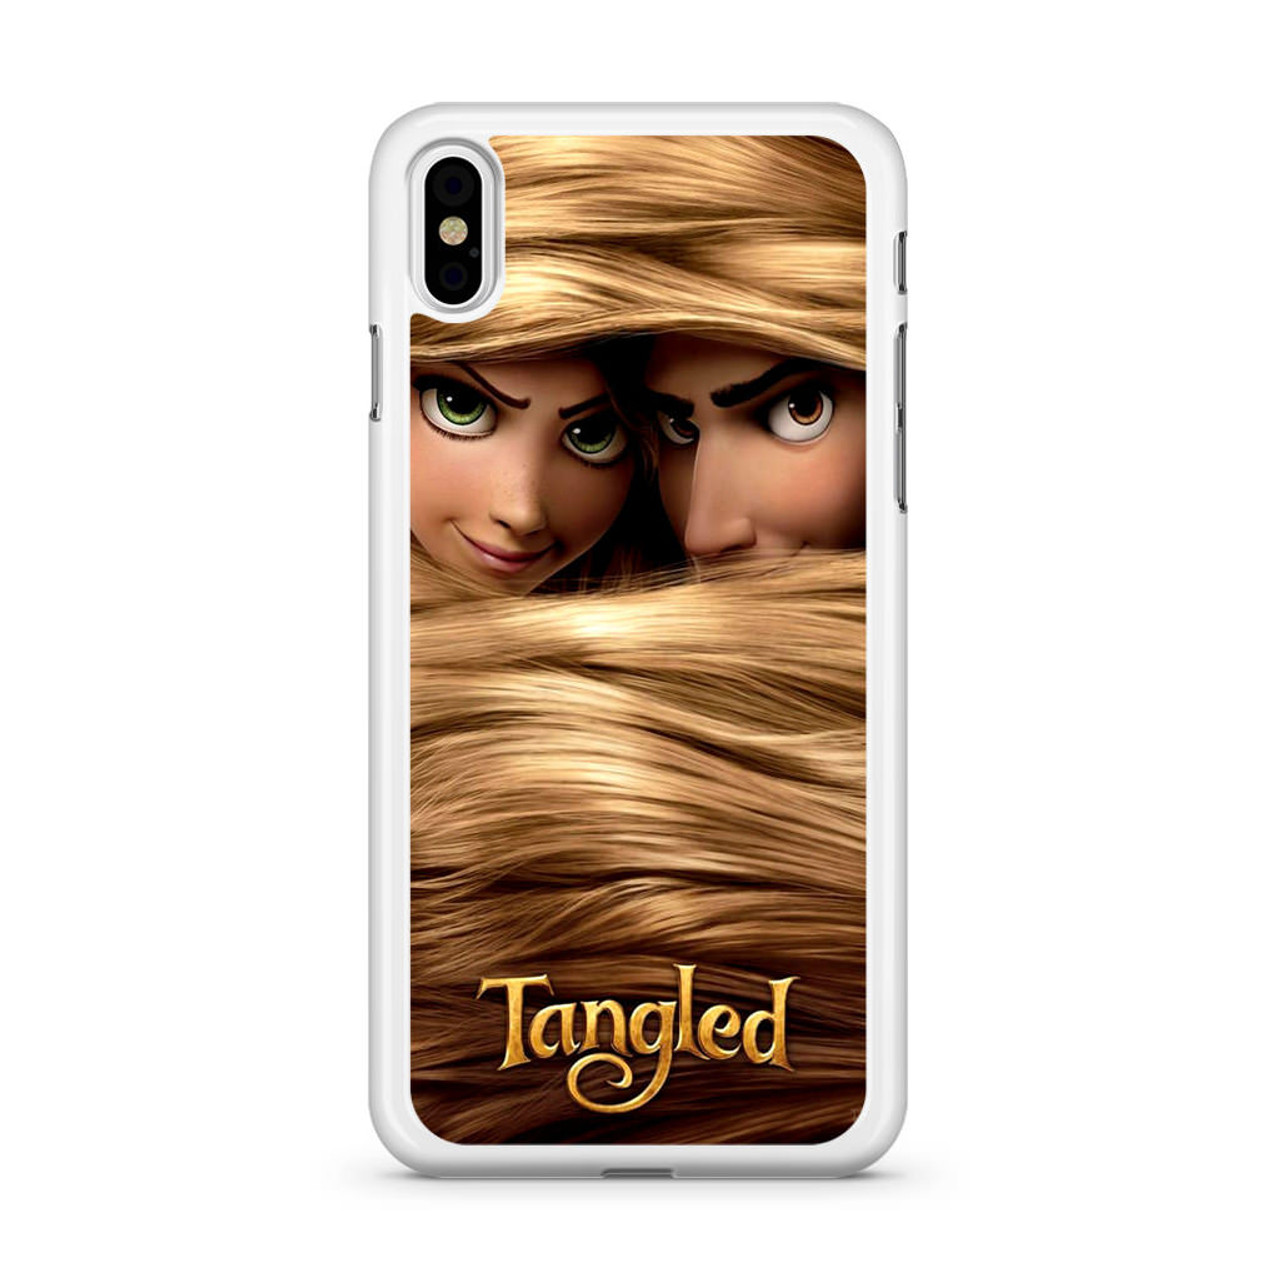 Tangled rapunzel Disney Case iPhone xs